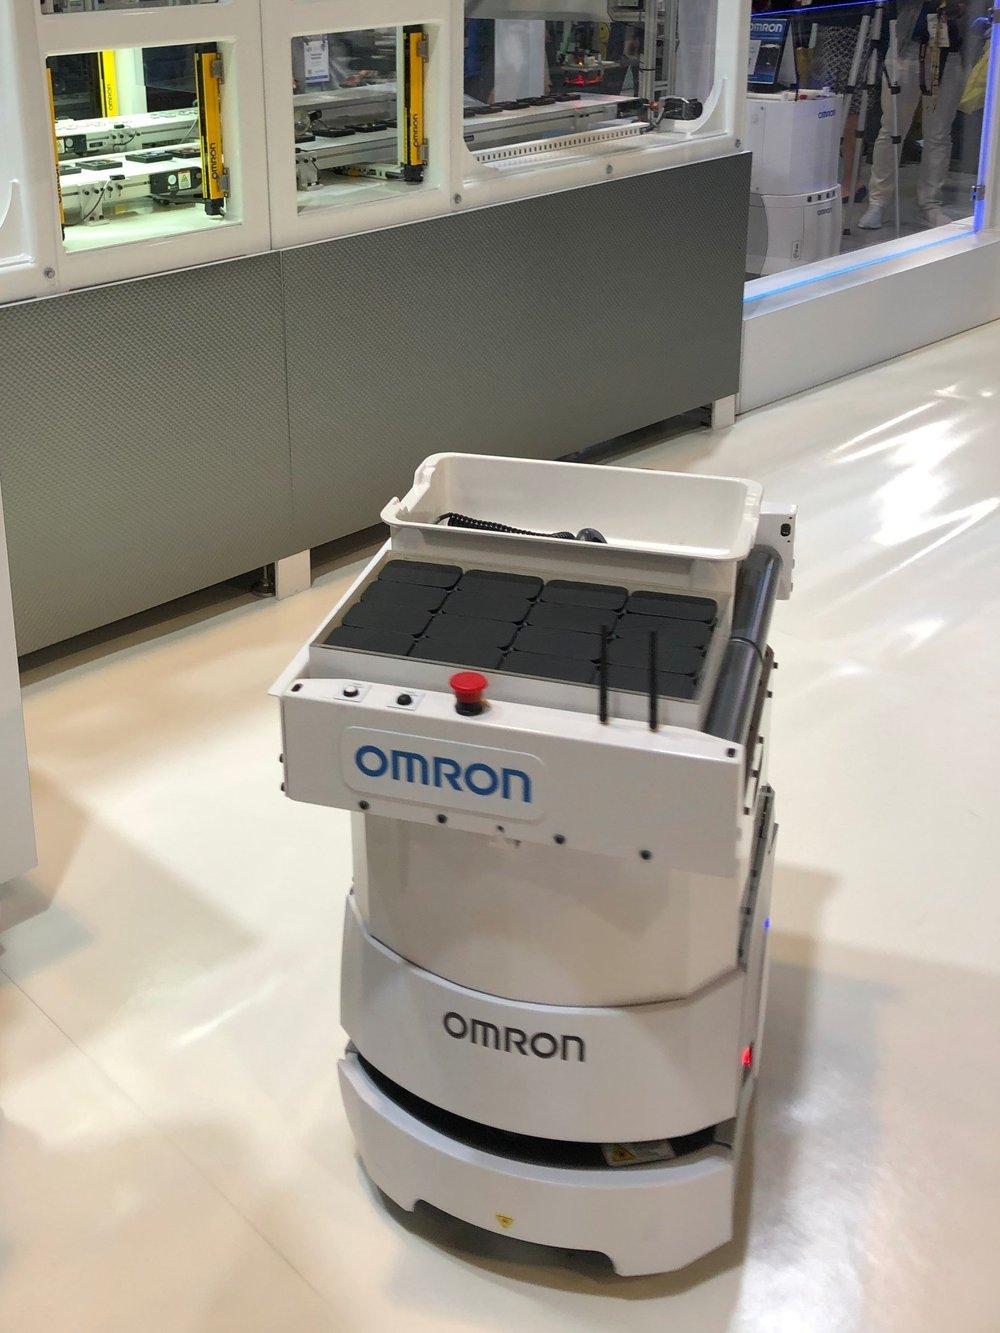 omron+ces+2019.jpg